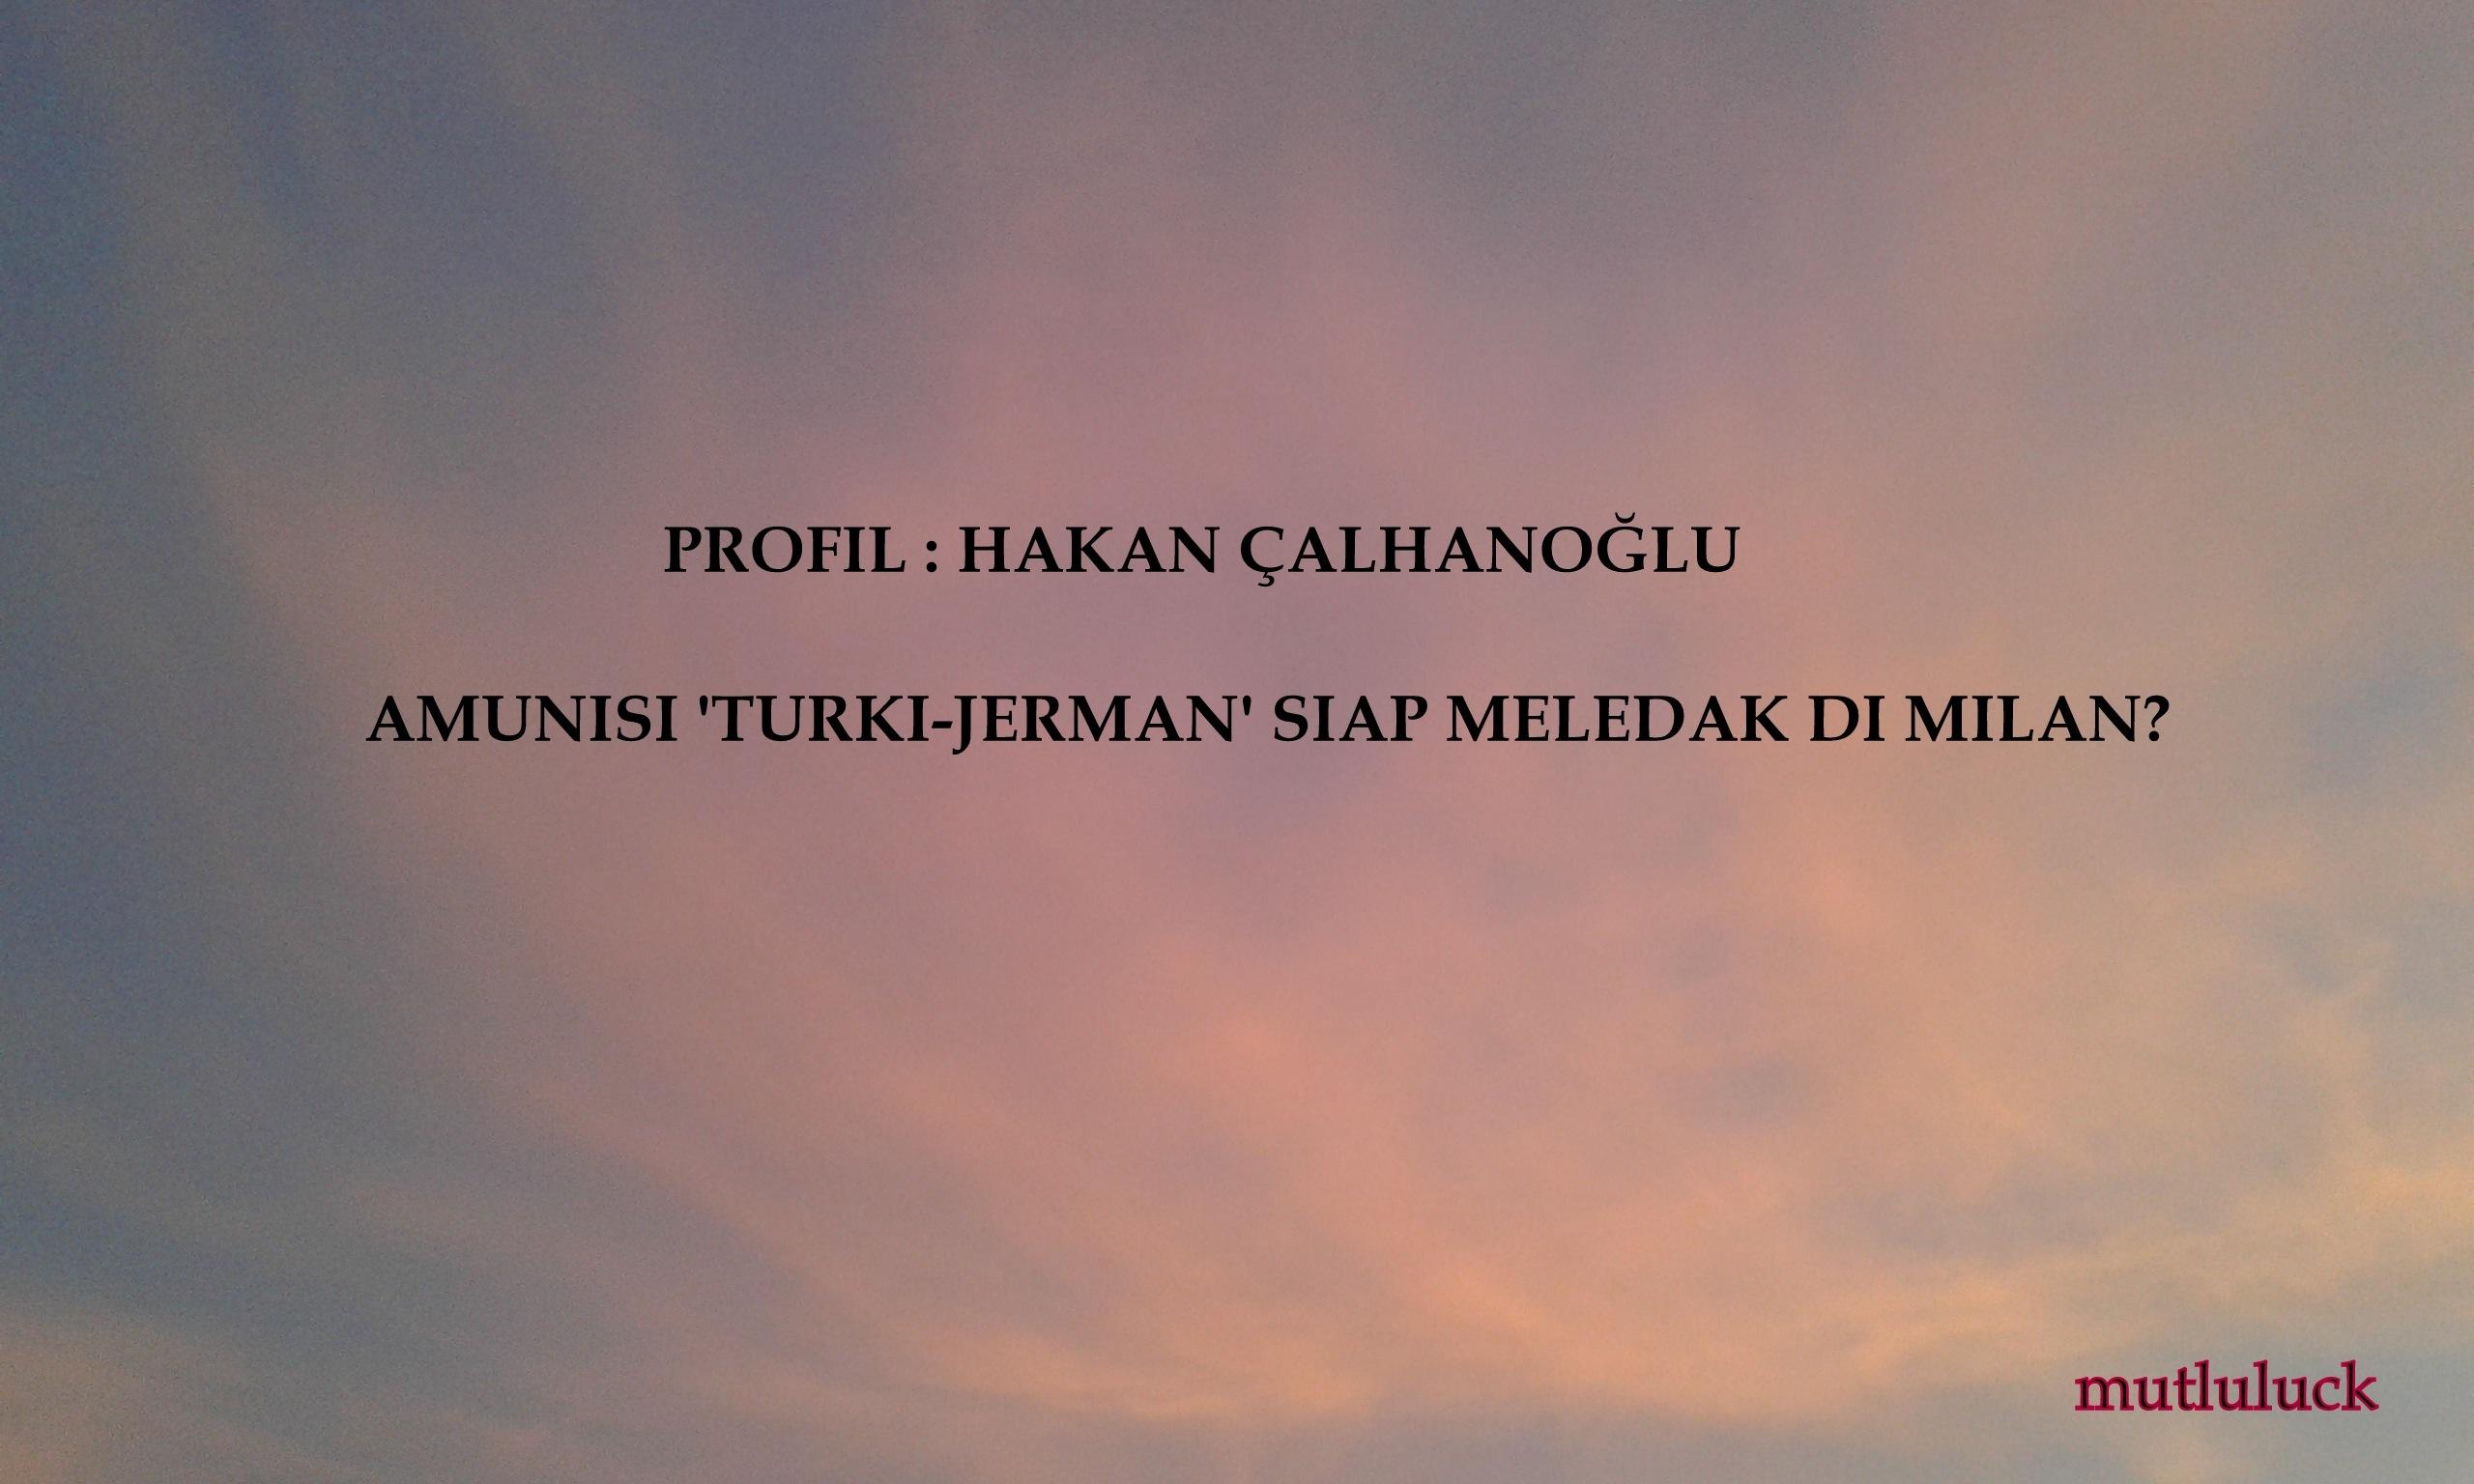 HAKAN ÇALHANOĞLU, AMUNISI 'TURKI-JERMAN' SIAP MELEDAK DI MILAN?